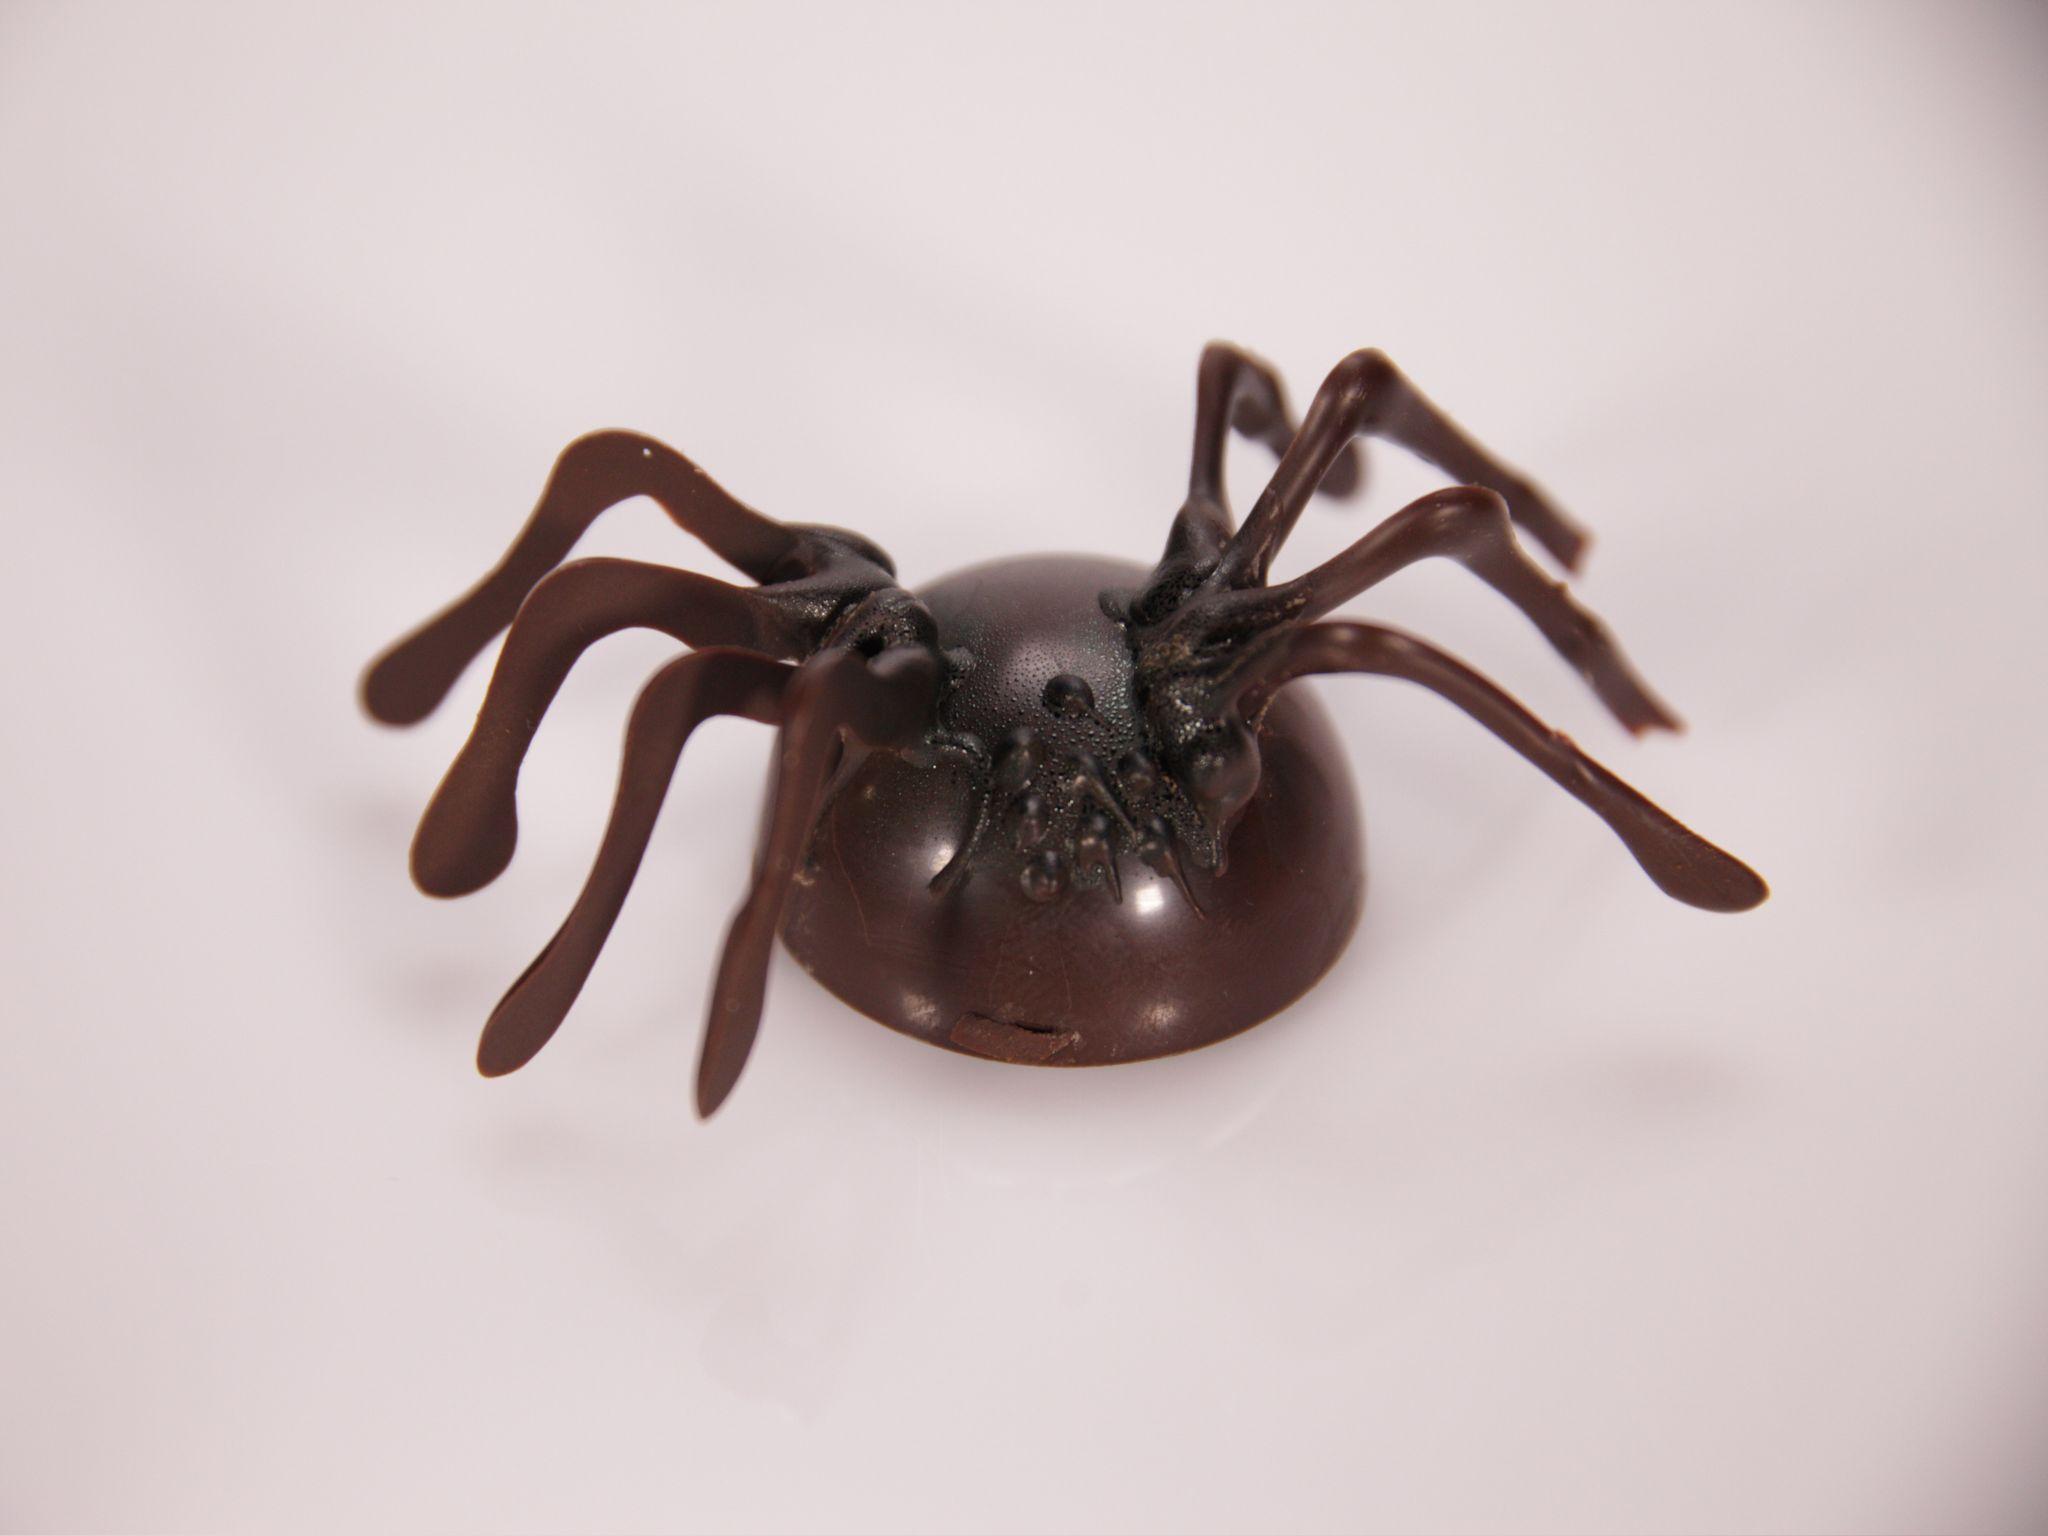 halloween recipe - Halloween Chocolate Spiders